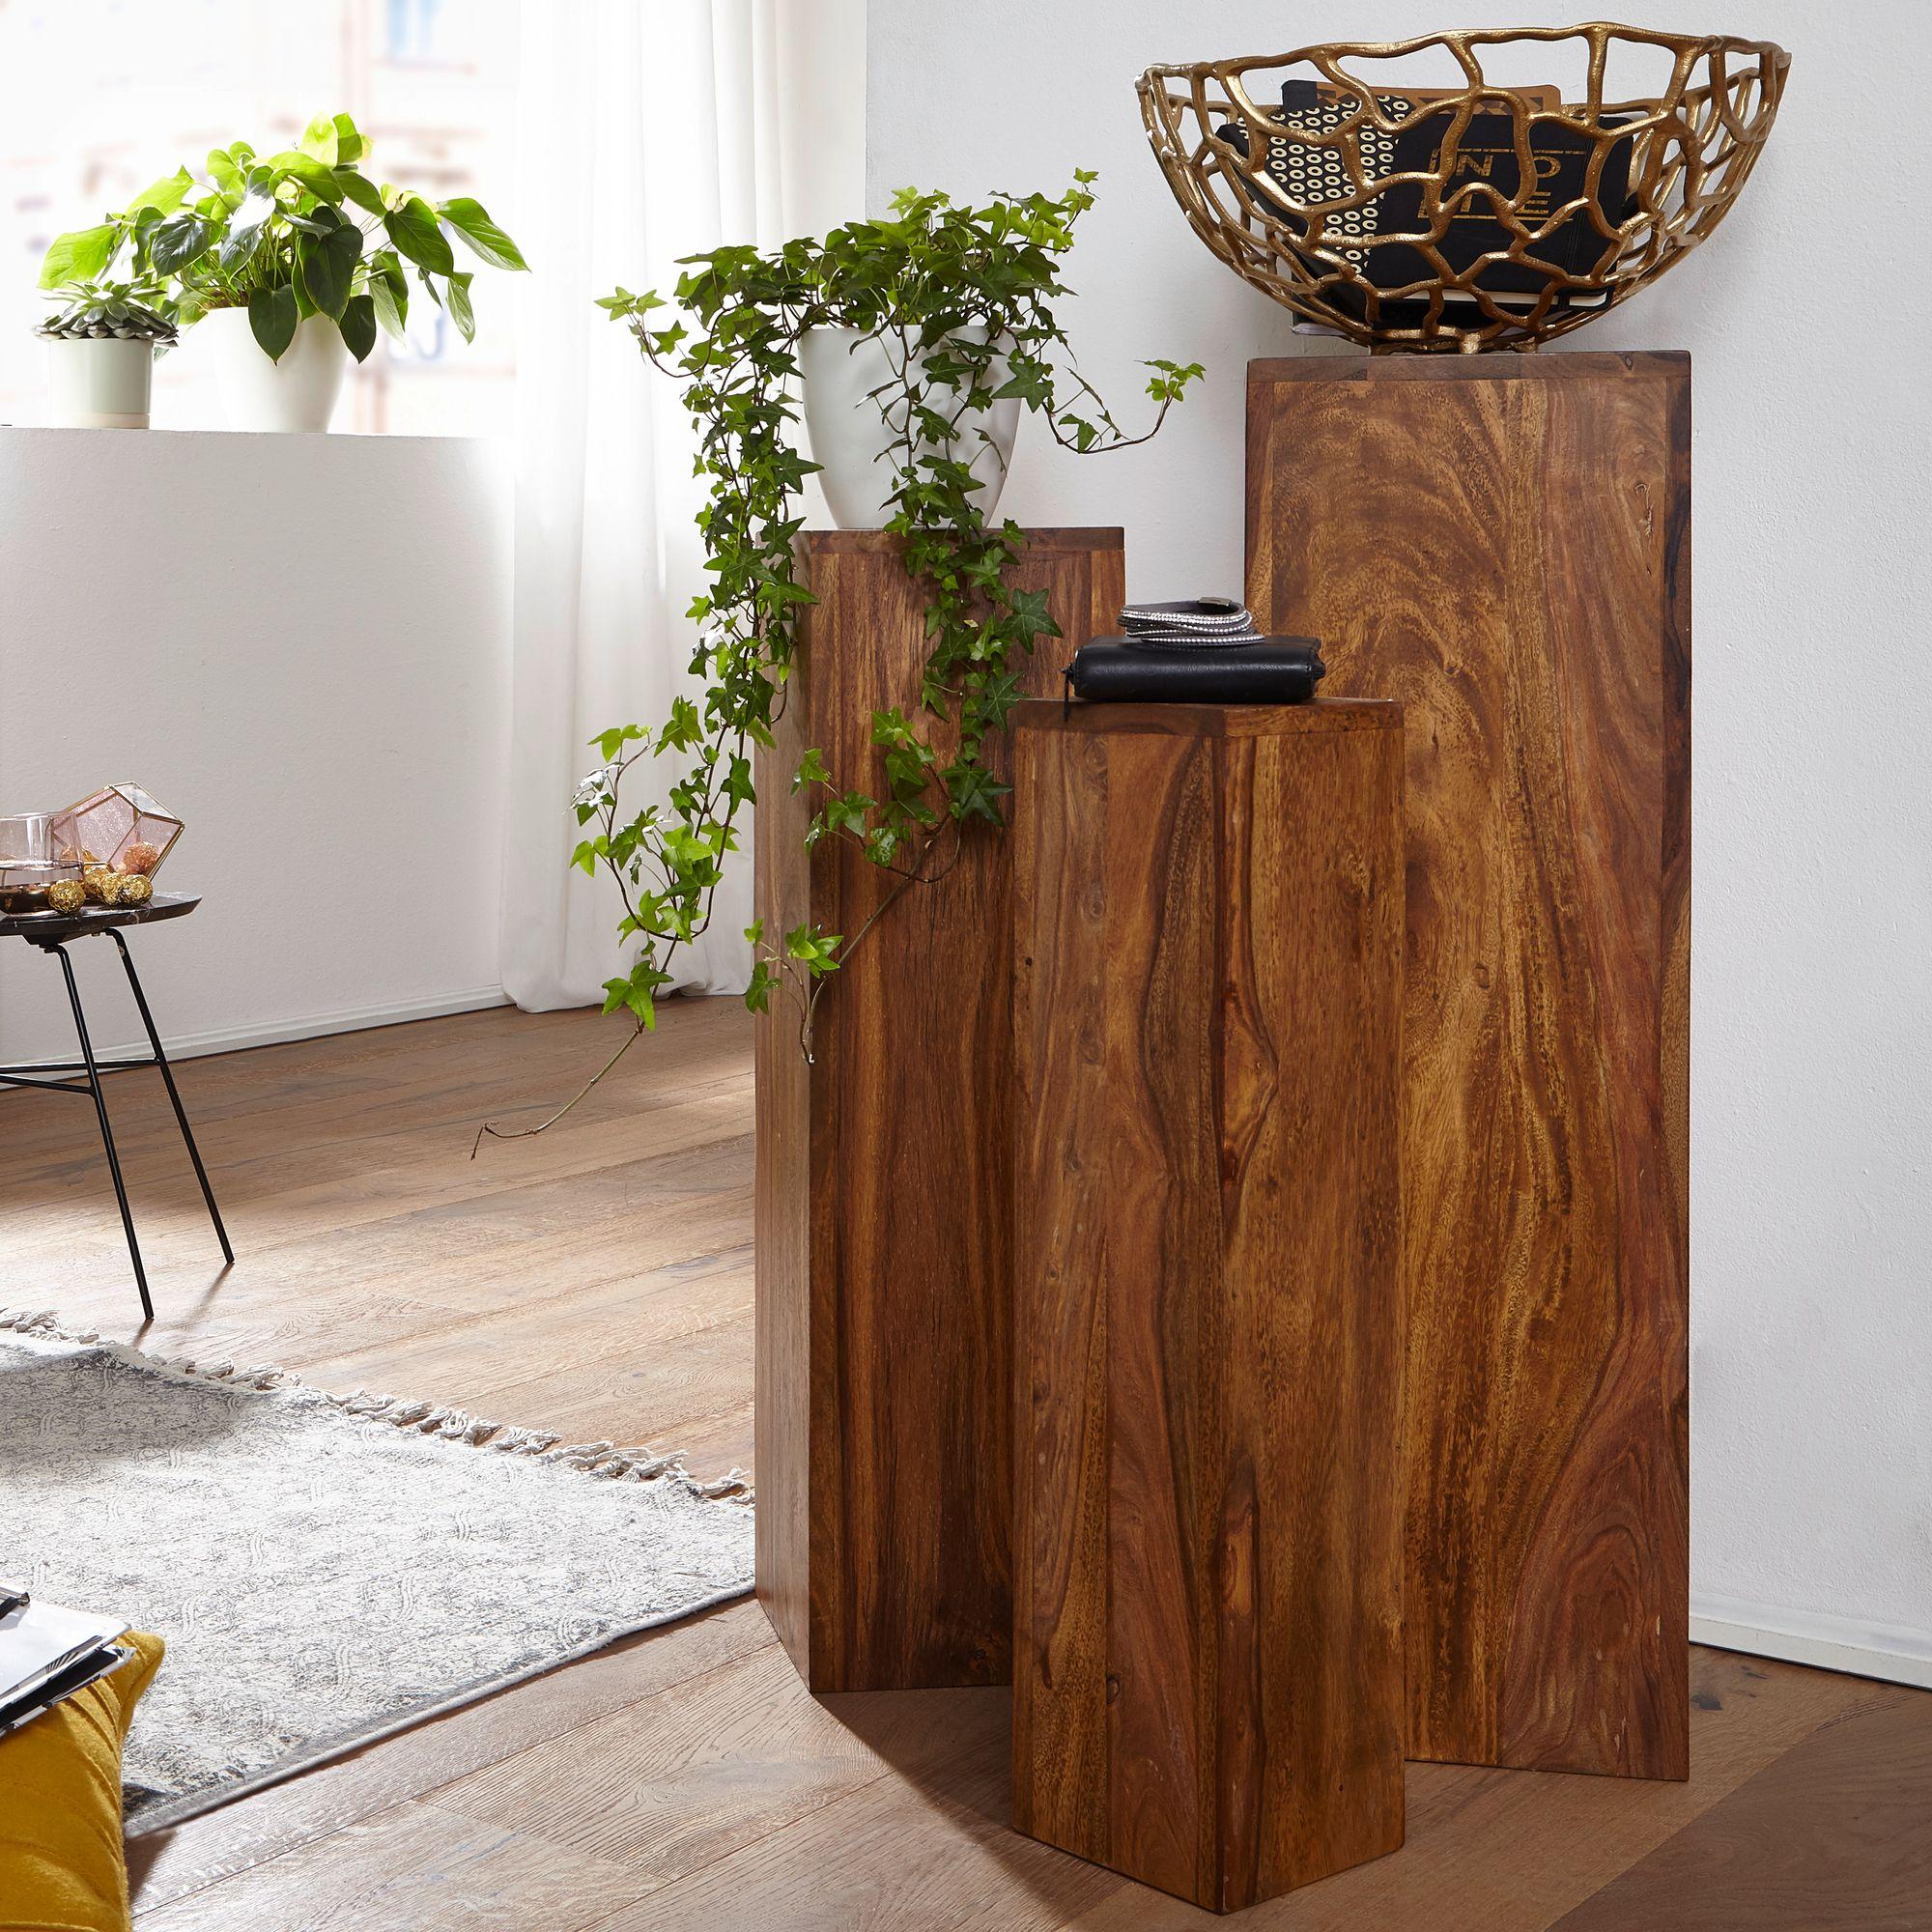 WOHNLING Beistelltisch 8er Set WL8.8 Massivholz 8,8x88x8,8 cm Sheesham  Tische  Holztisch Natur-Produkt  Echtholz Beistelltische Dekosäulen